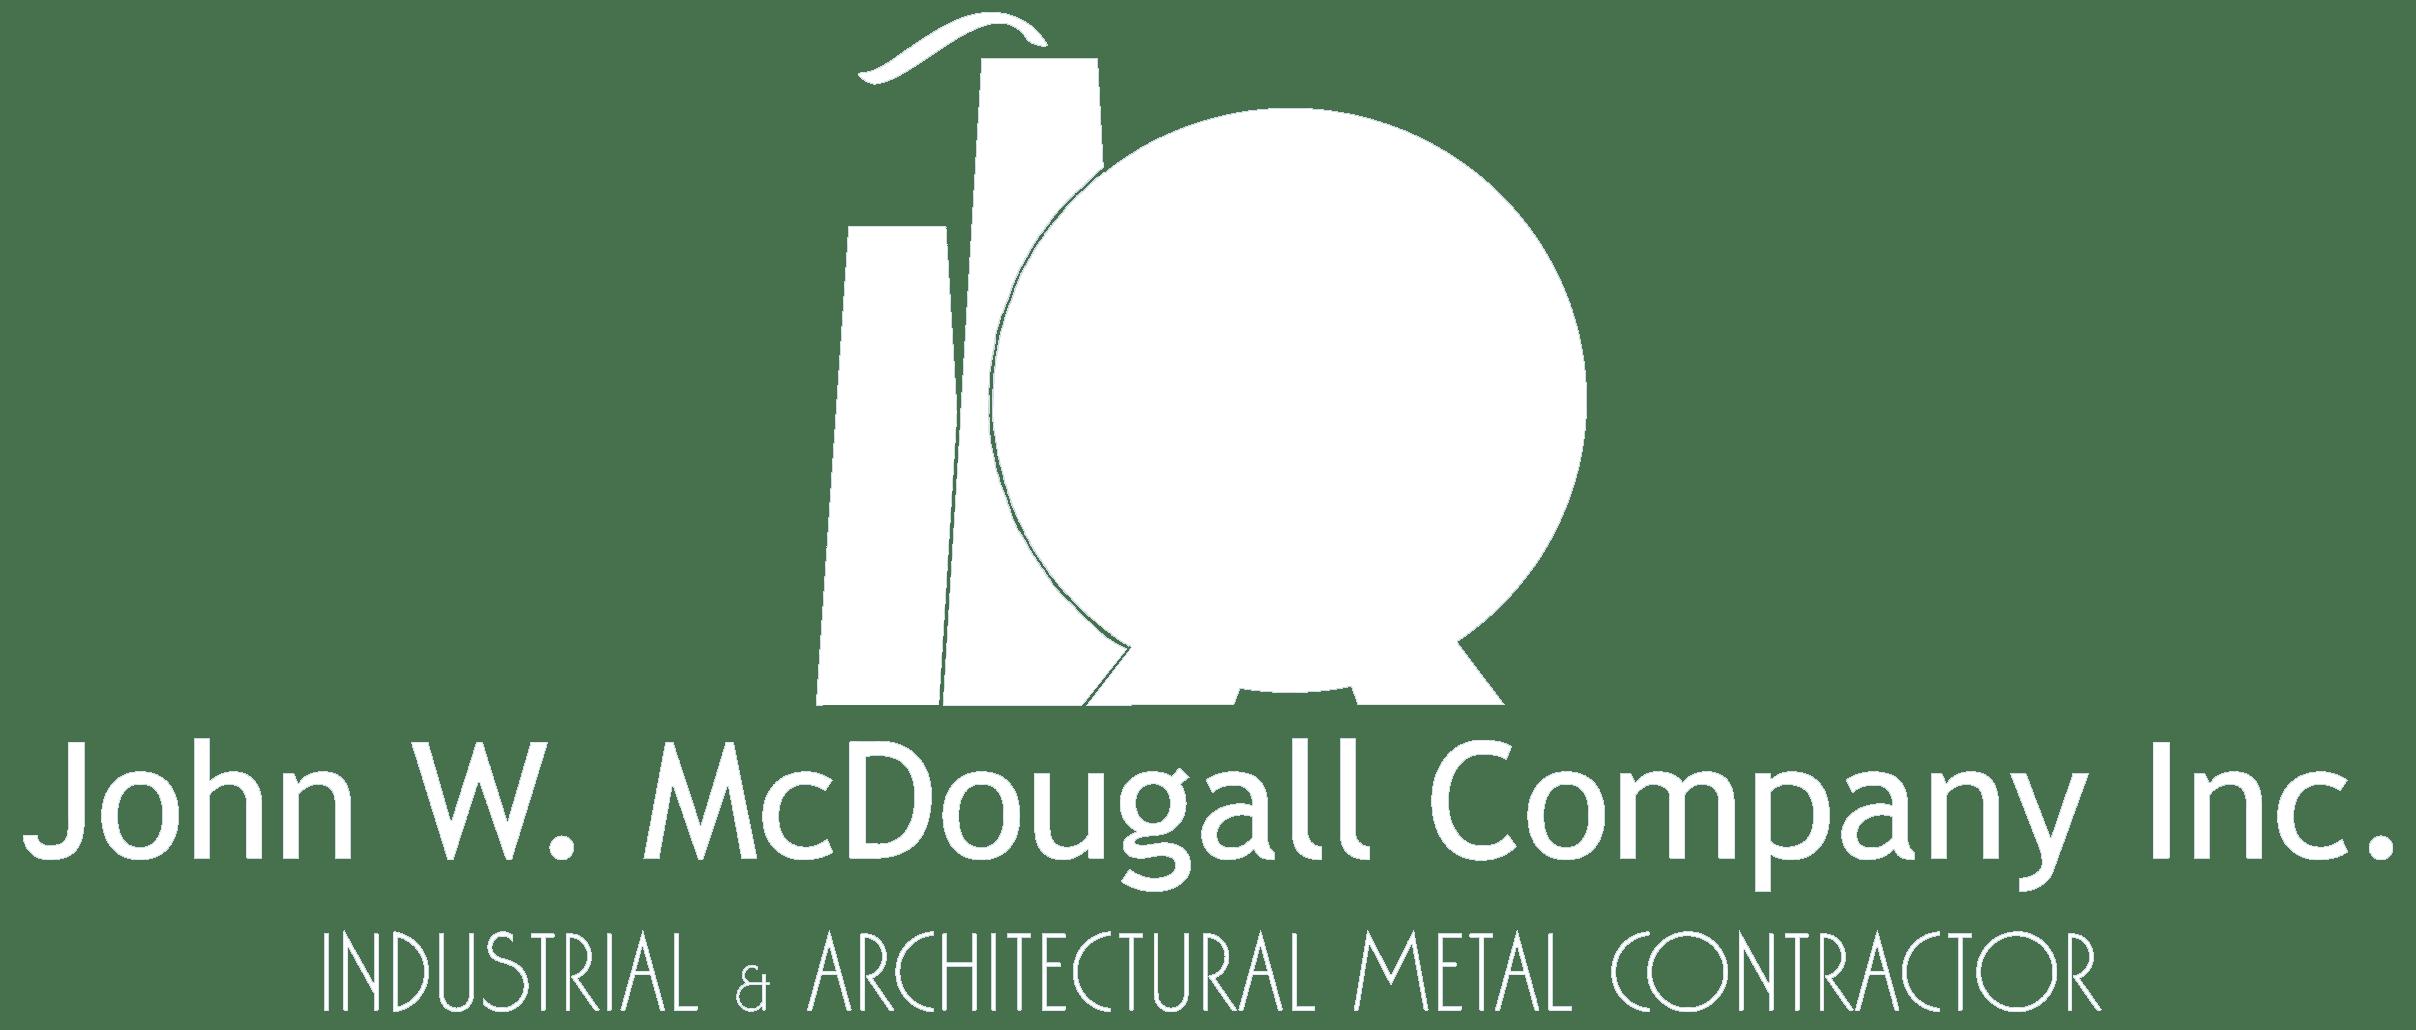 John McDougal | JLB web design, SEO, digital marketing and website support in Boca Raton and Fort Lauderdale FL